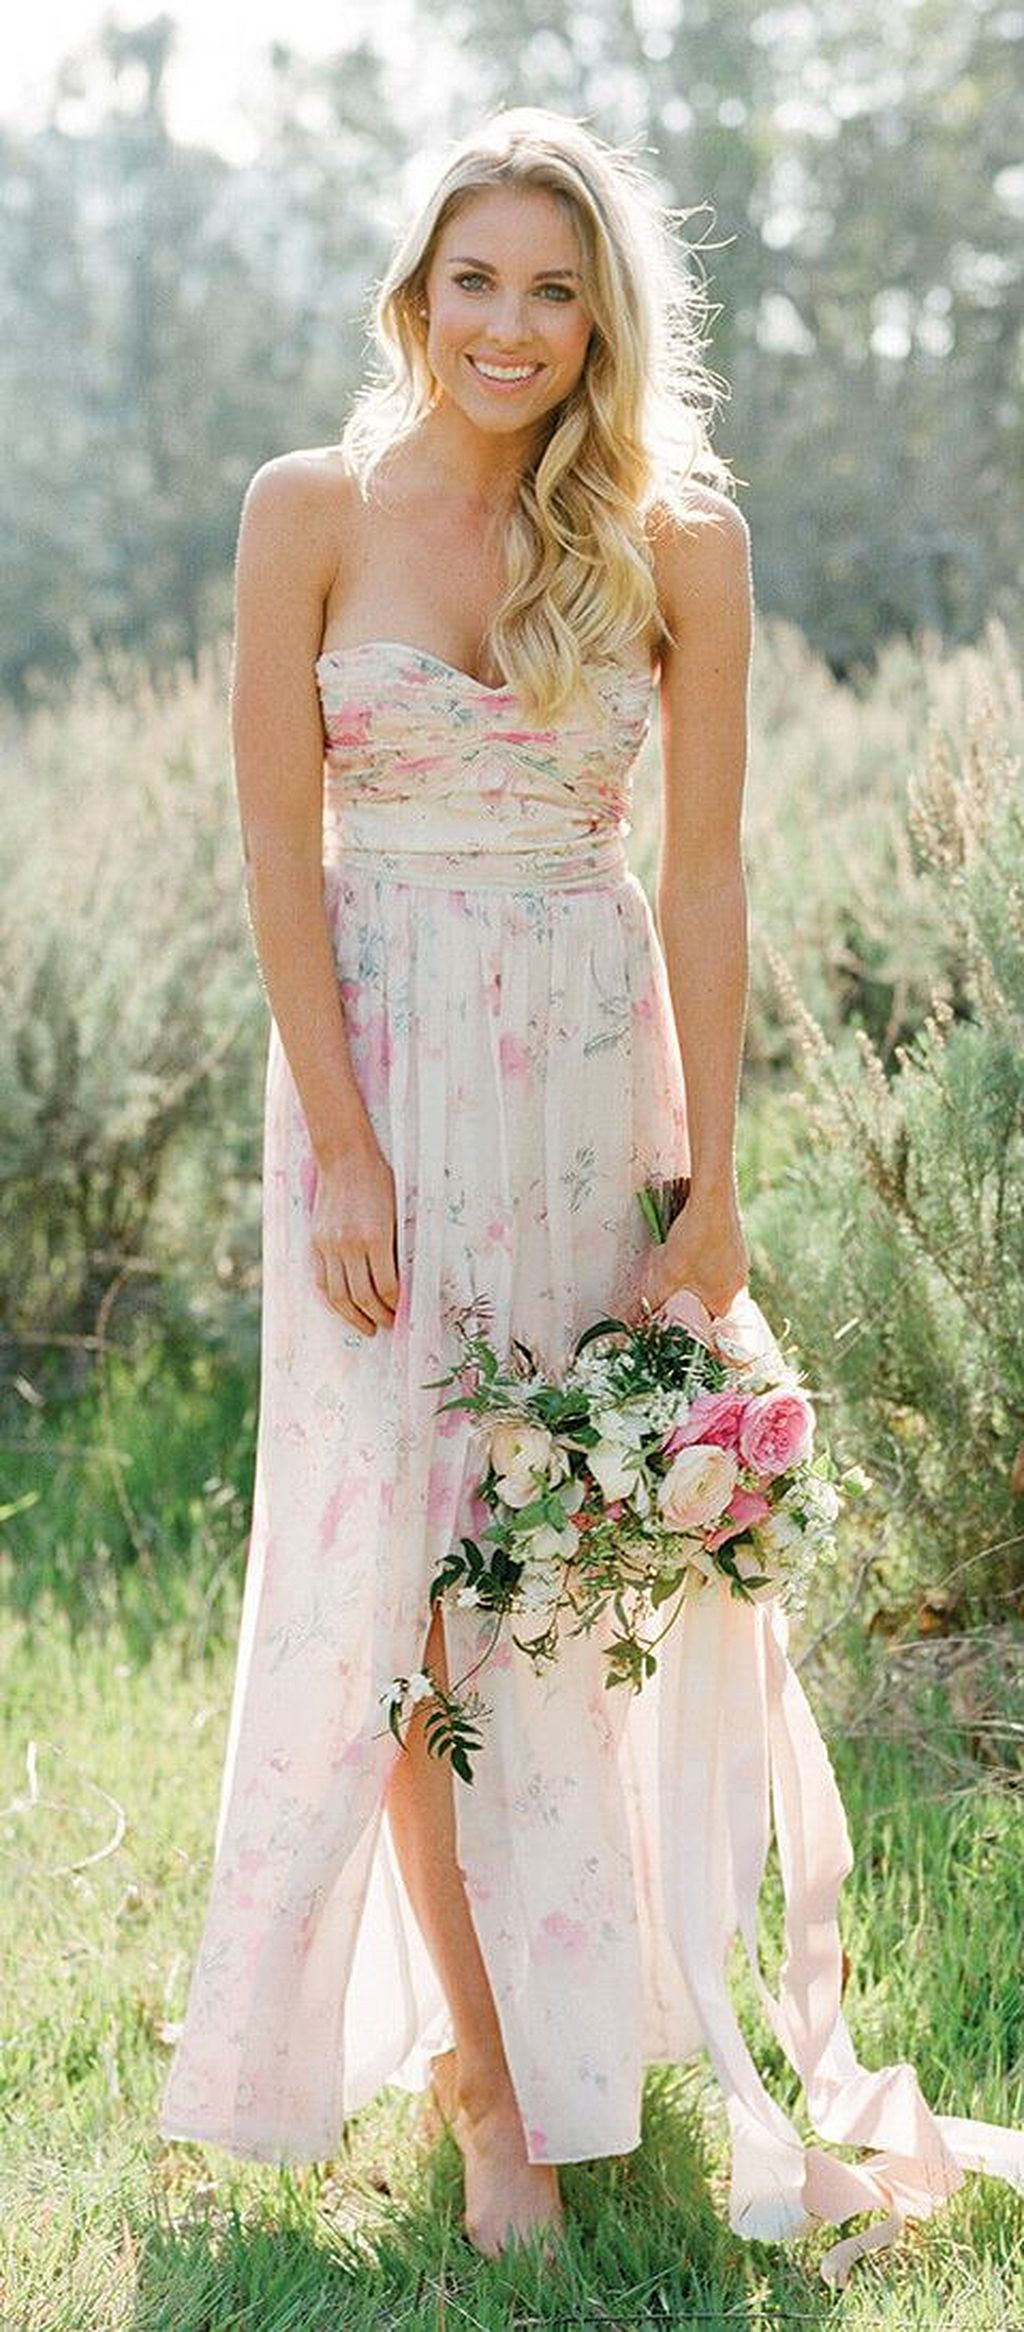 Floral print wedding dresses   Pretty Garden Wedding Dress Ideas  Garden wedding dresses